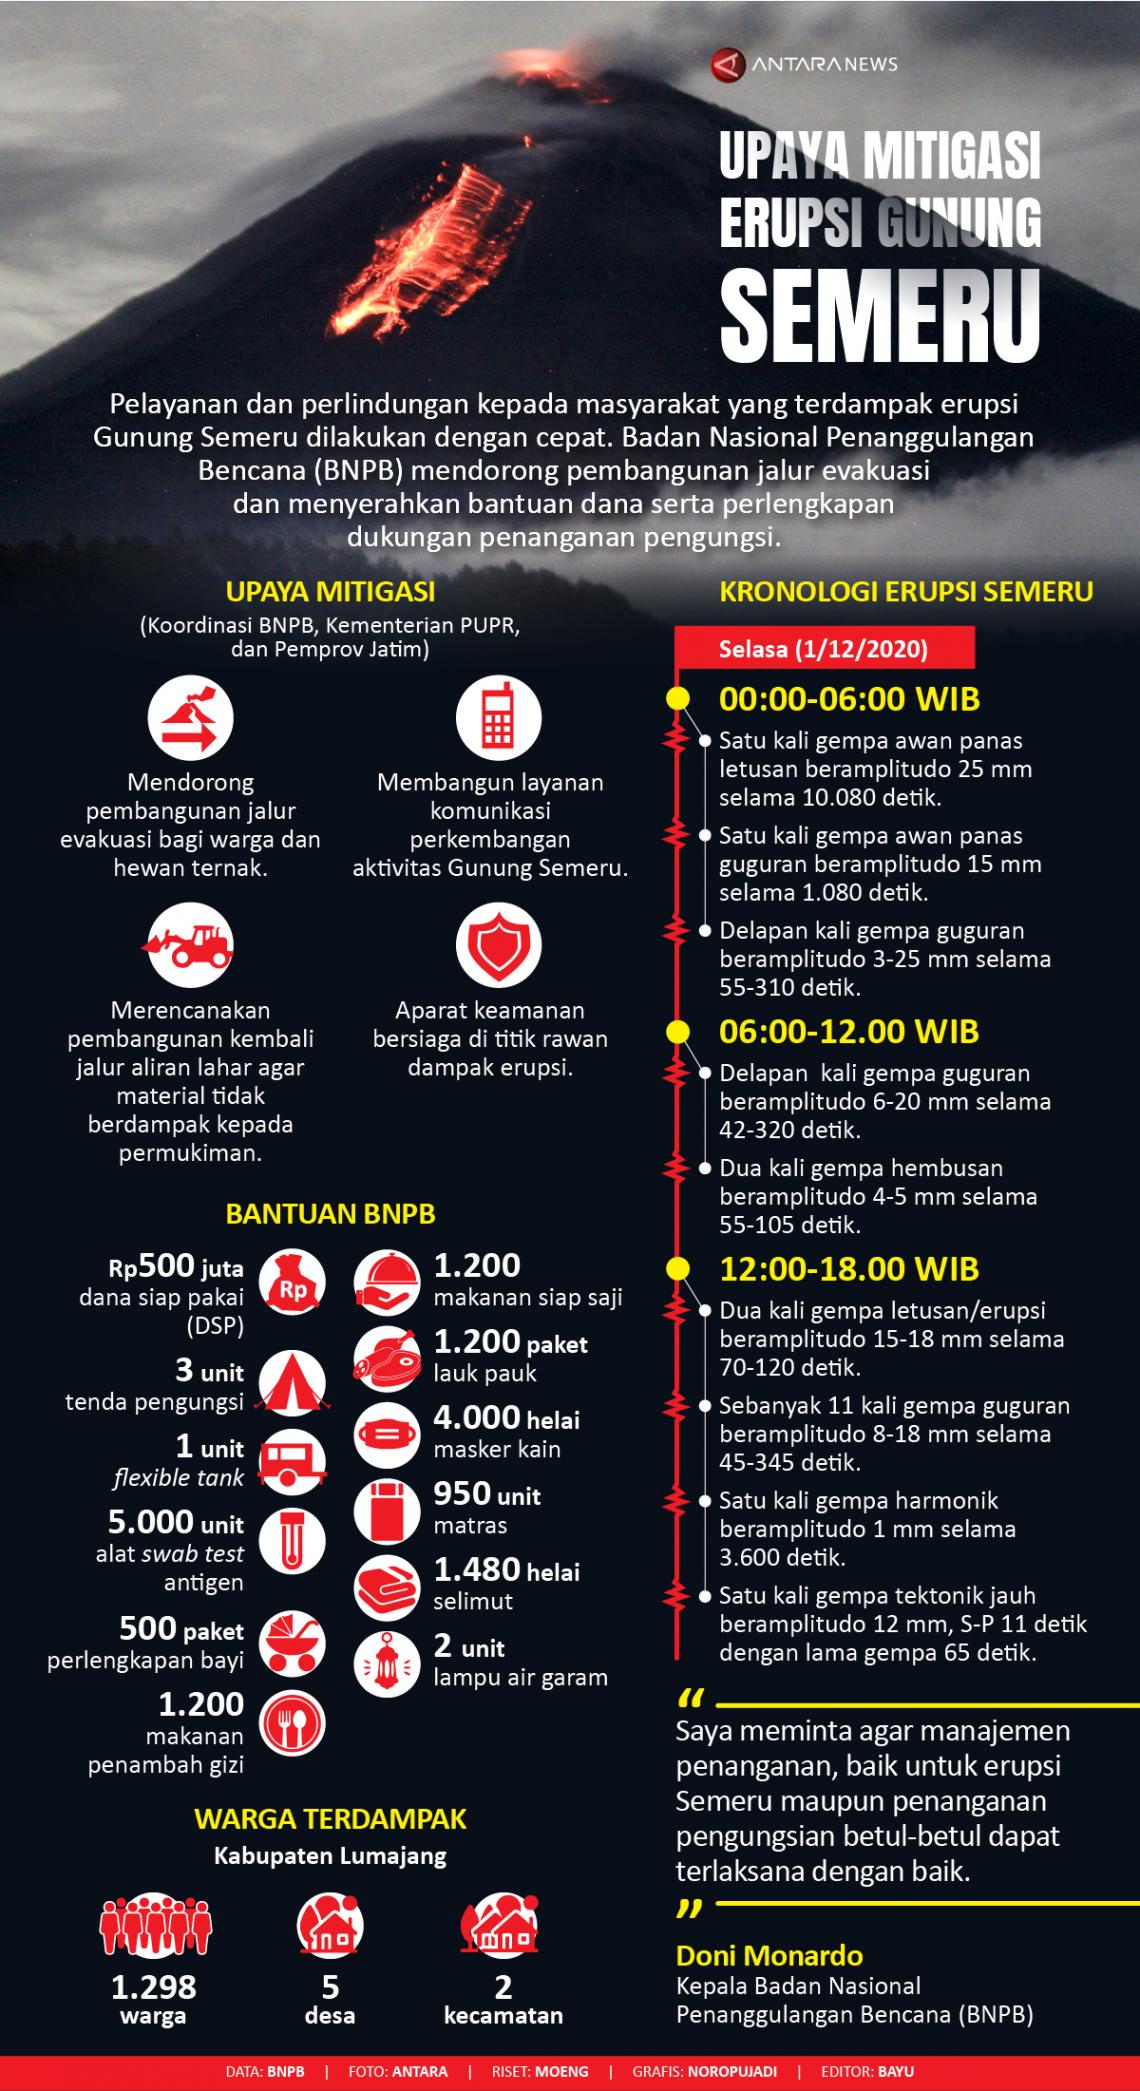 Infografik Upaya Mitigasi Erupsi Gunung Semeru Antara News